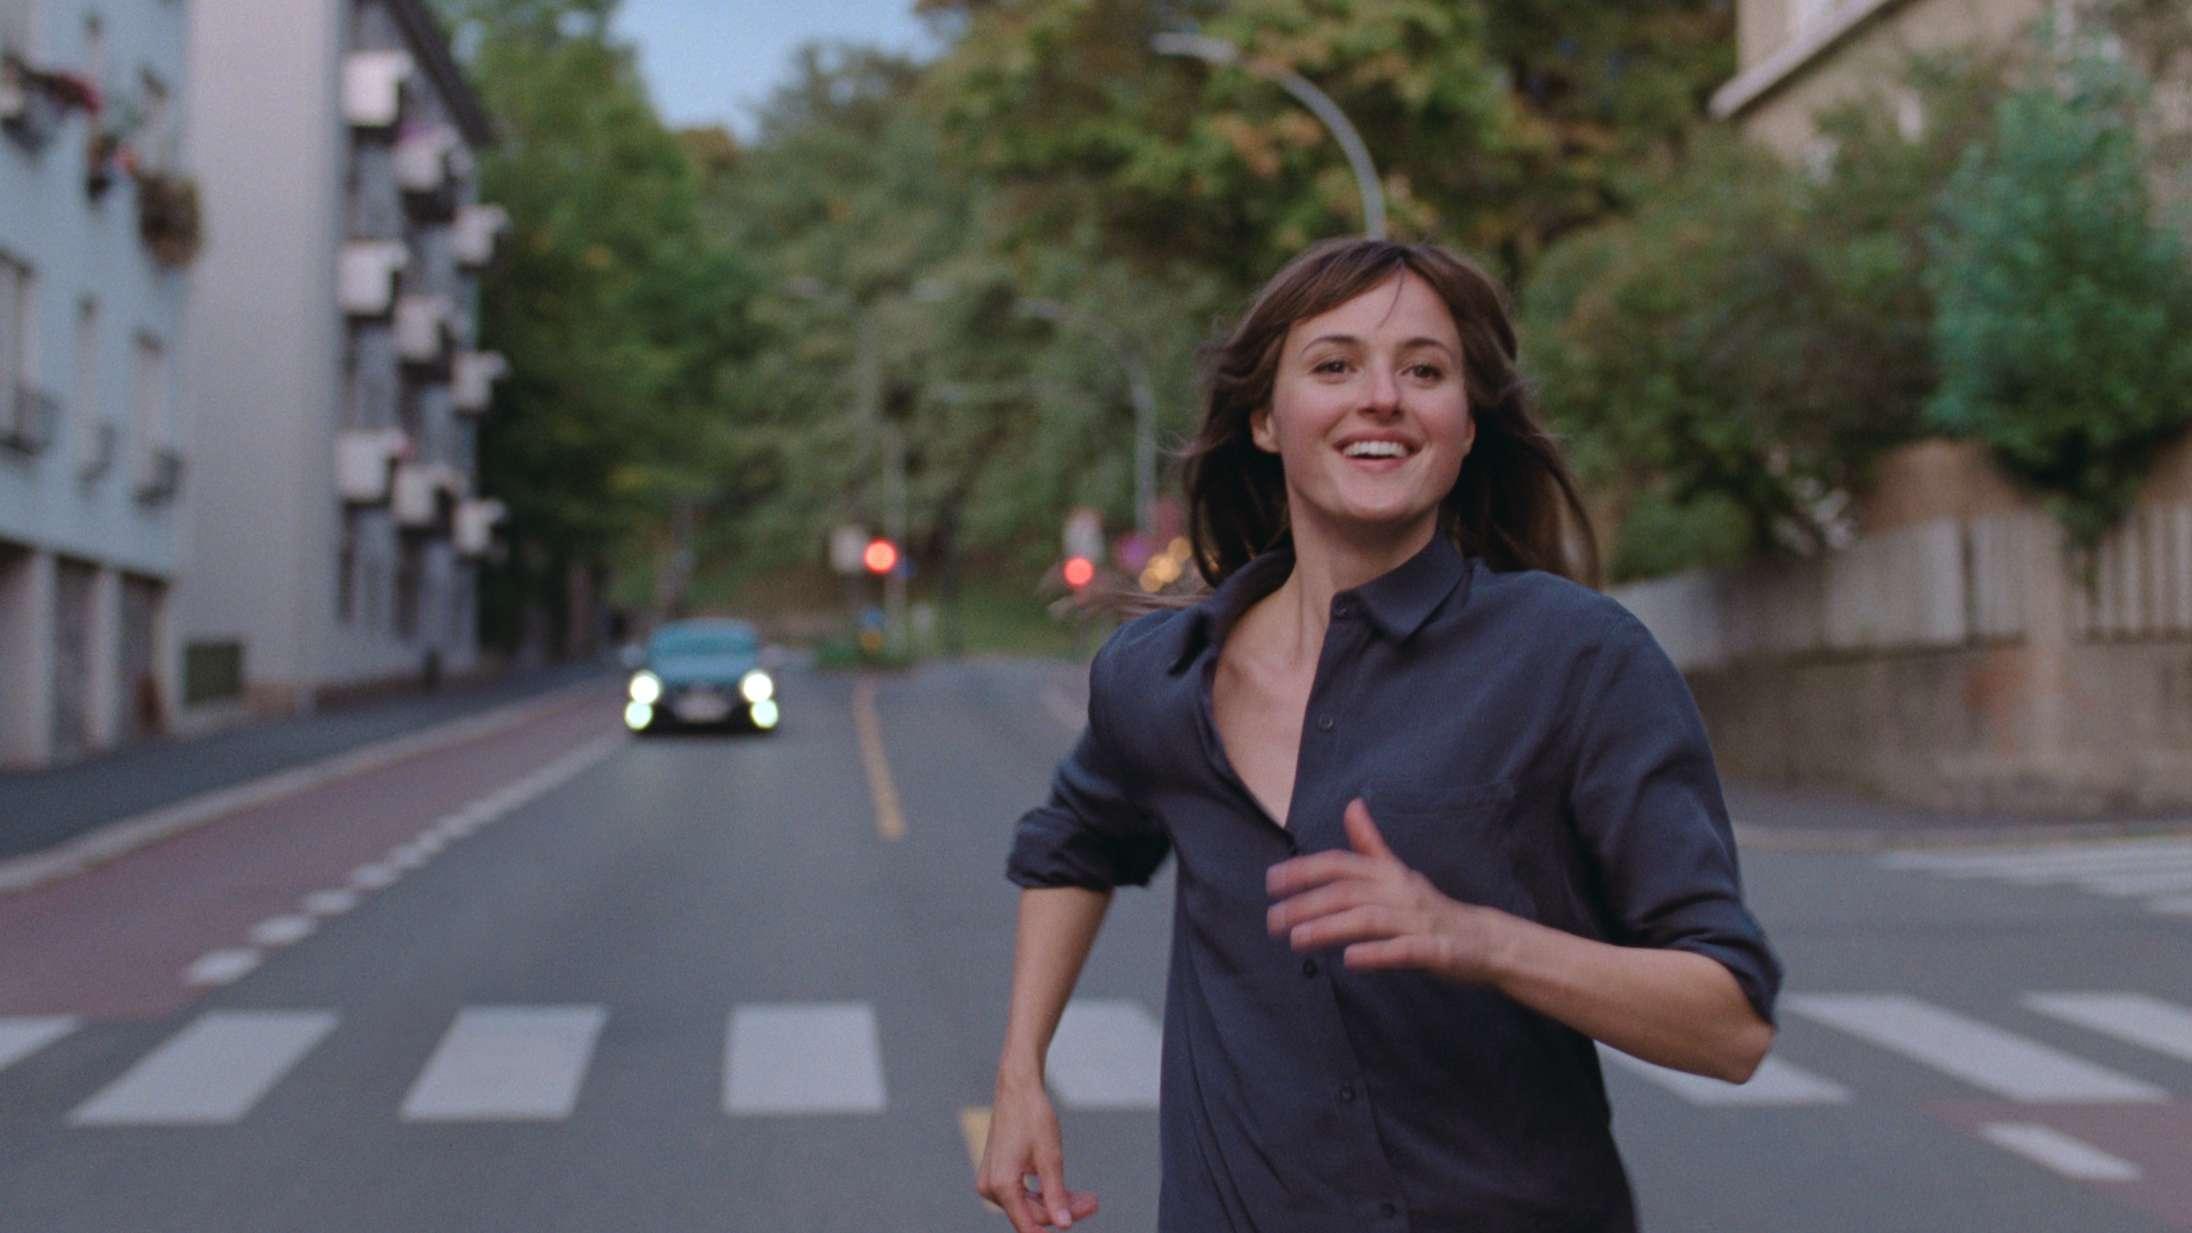 Er 30-årige Julie Verdens Værste Menneske? Se traileren til Joachim Triers roste nye film